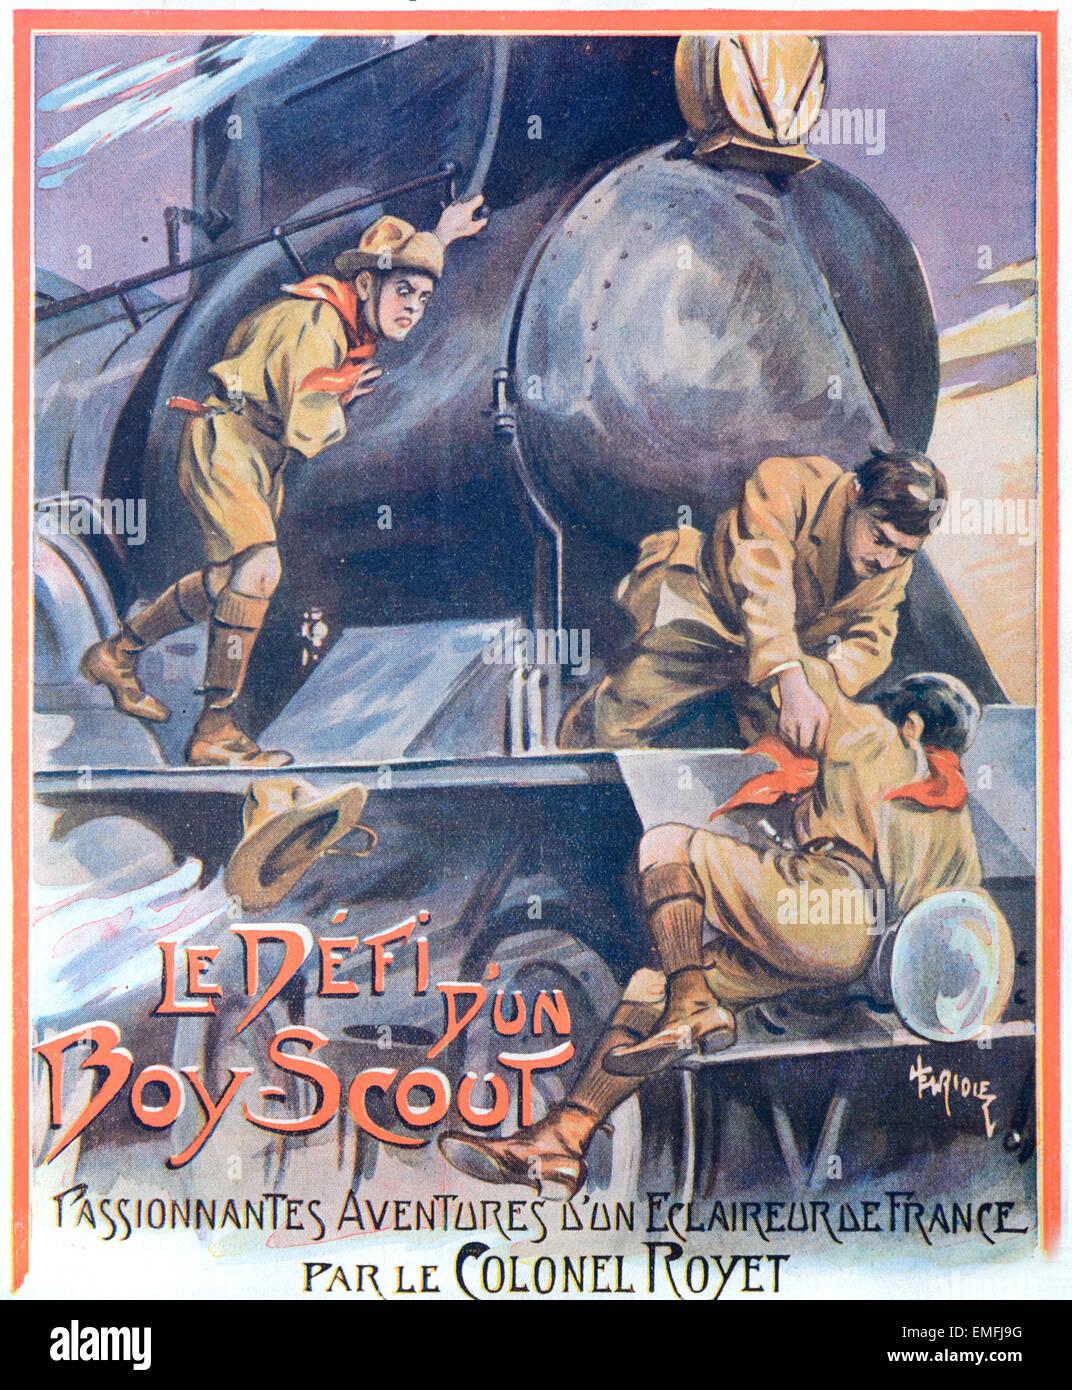 Boy Scout Book Stockfotos & Boy Scout Book Bilder - Alamy